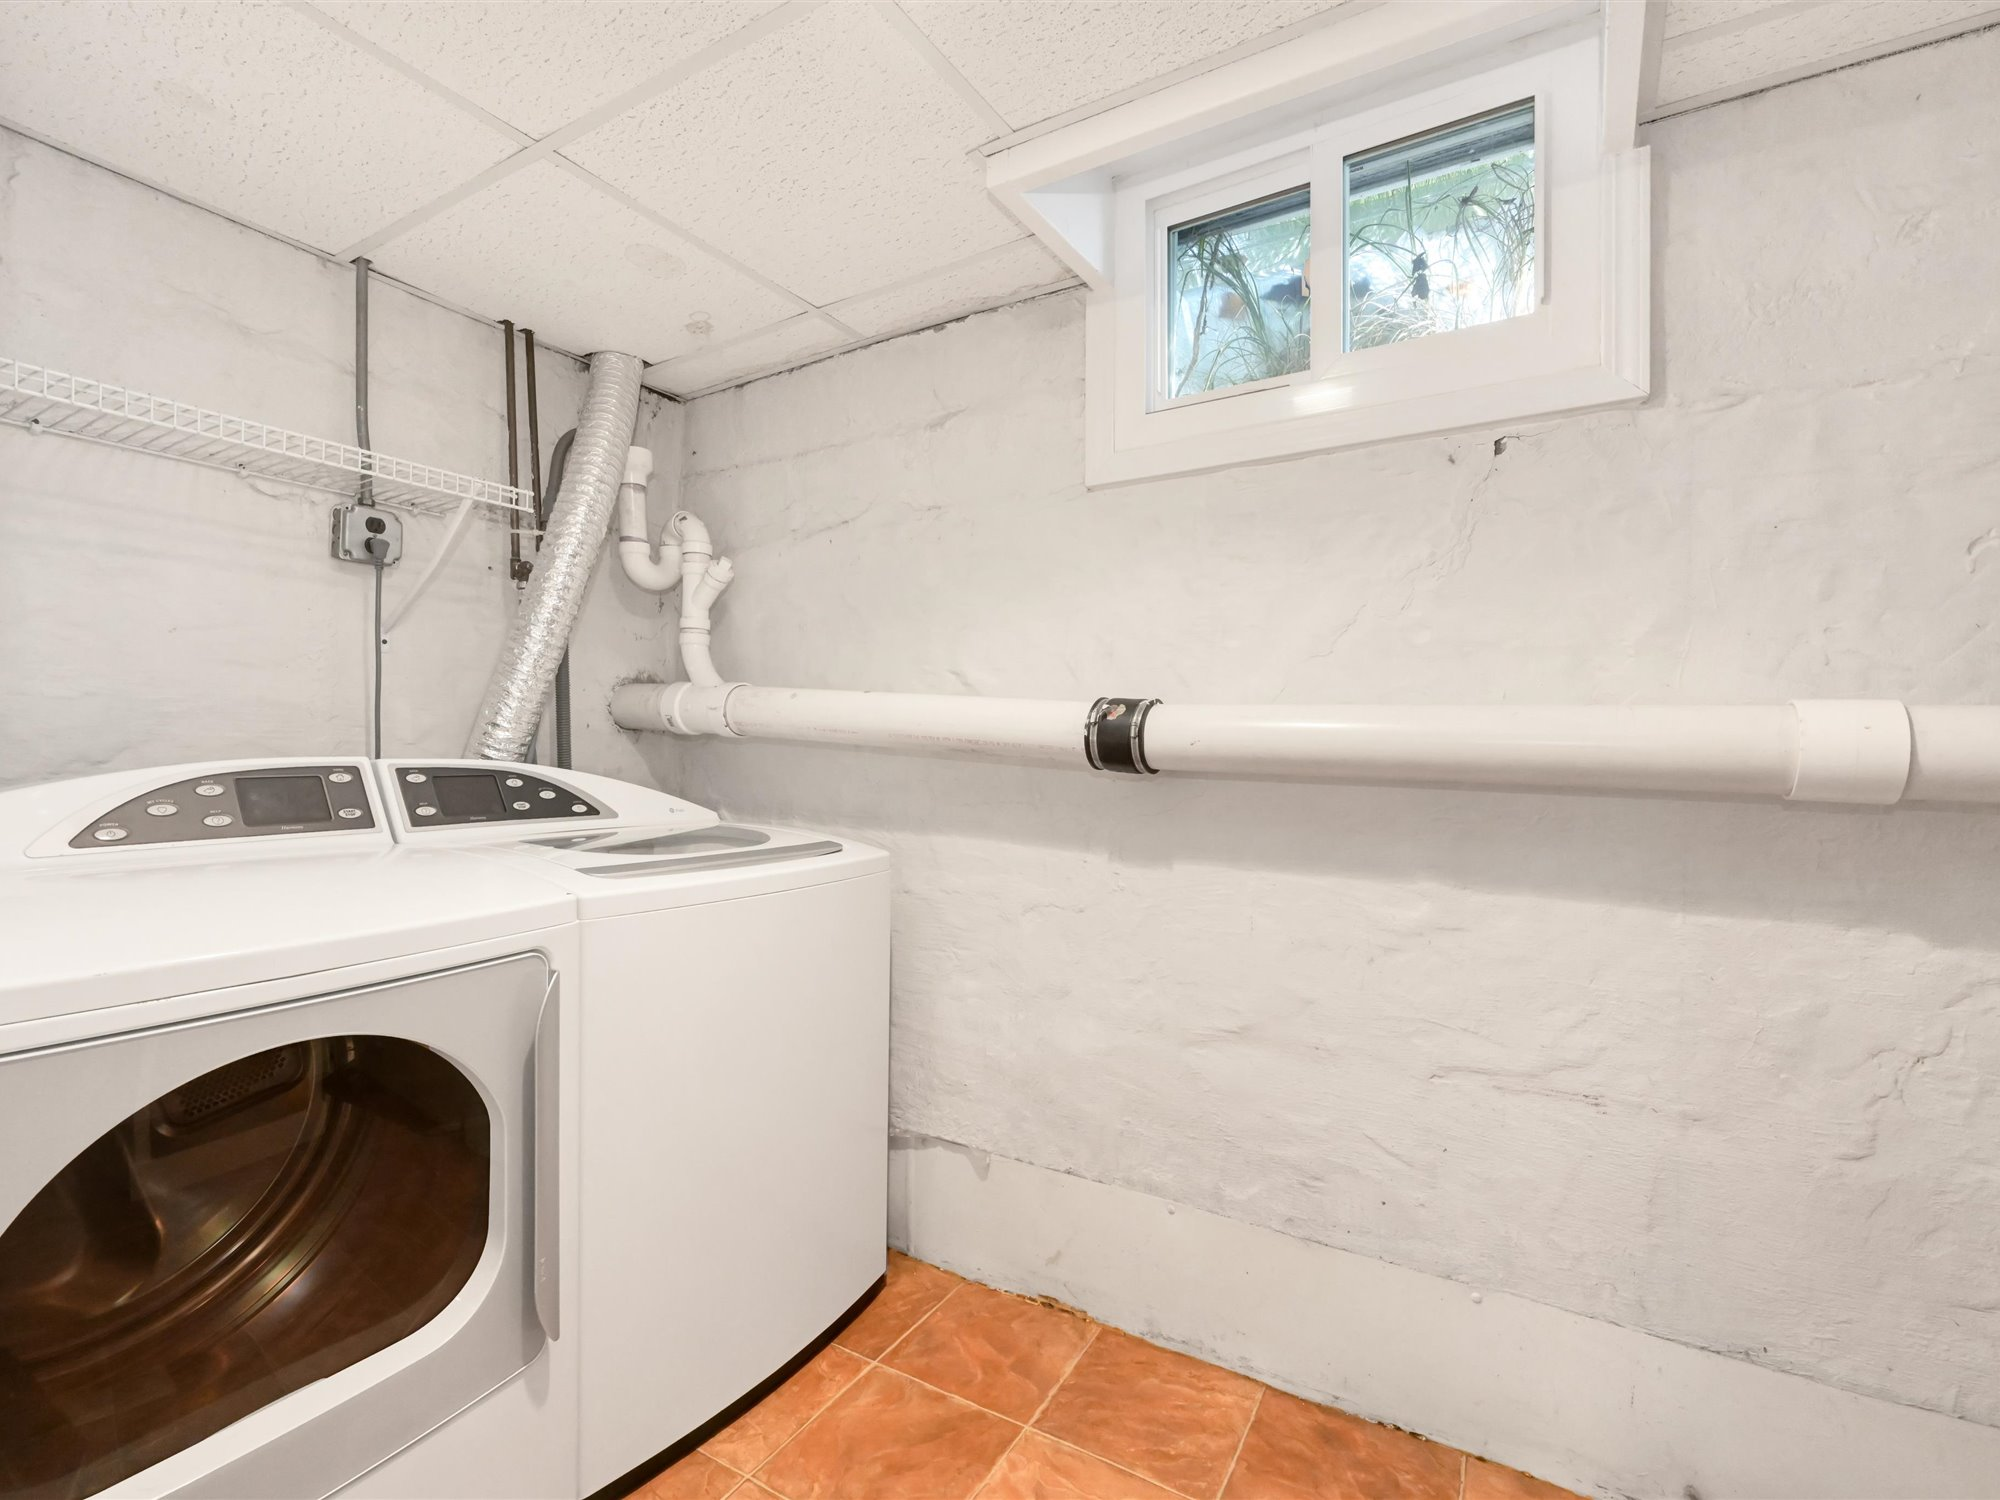 111 Pine Street - Laundry Room